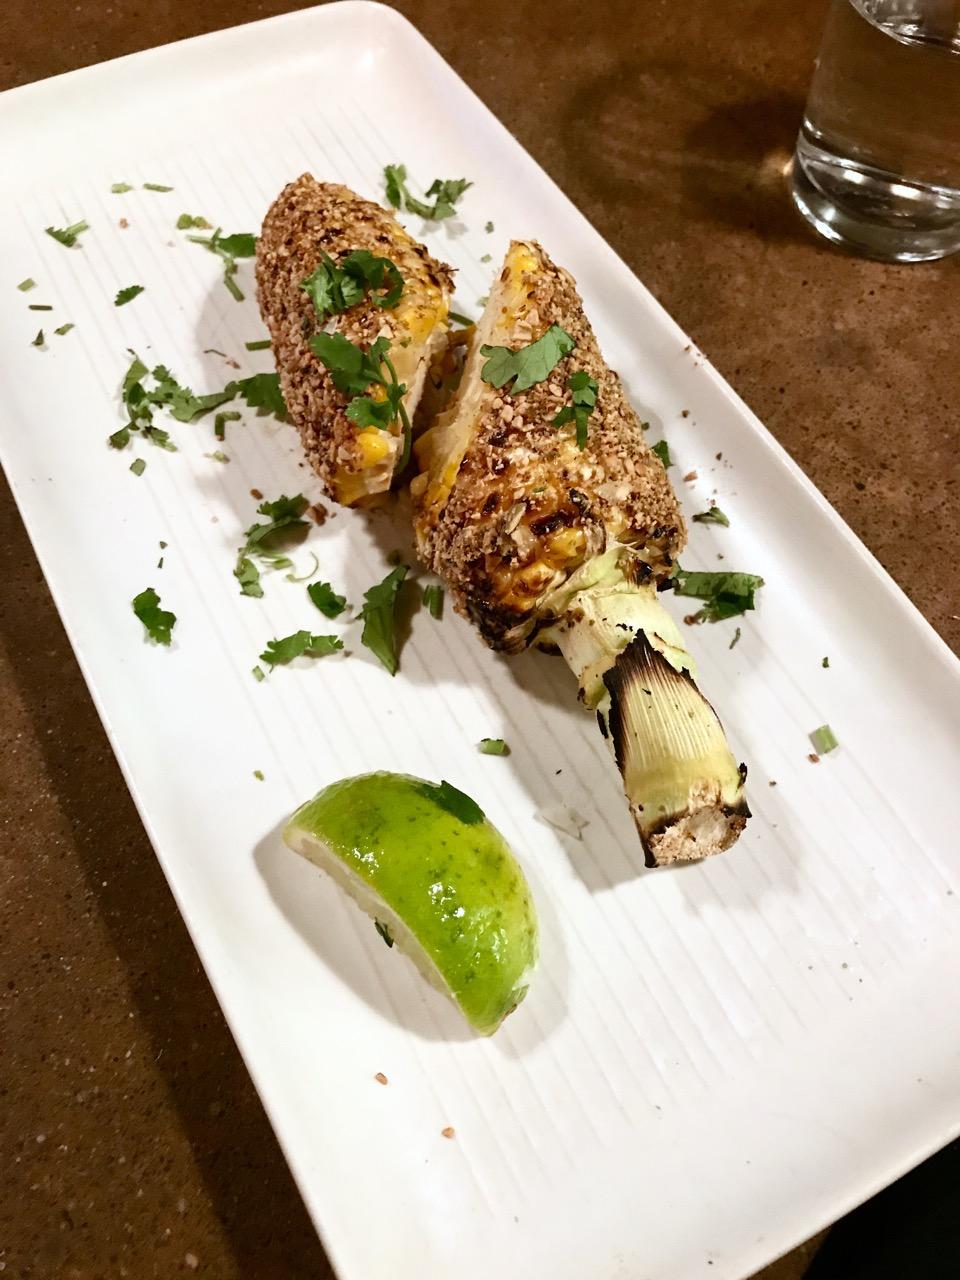 Grilled corn with vegan aioli + crushed pepitas at Gracias Madre in San Francisco